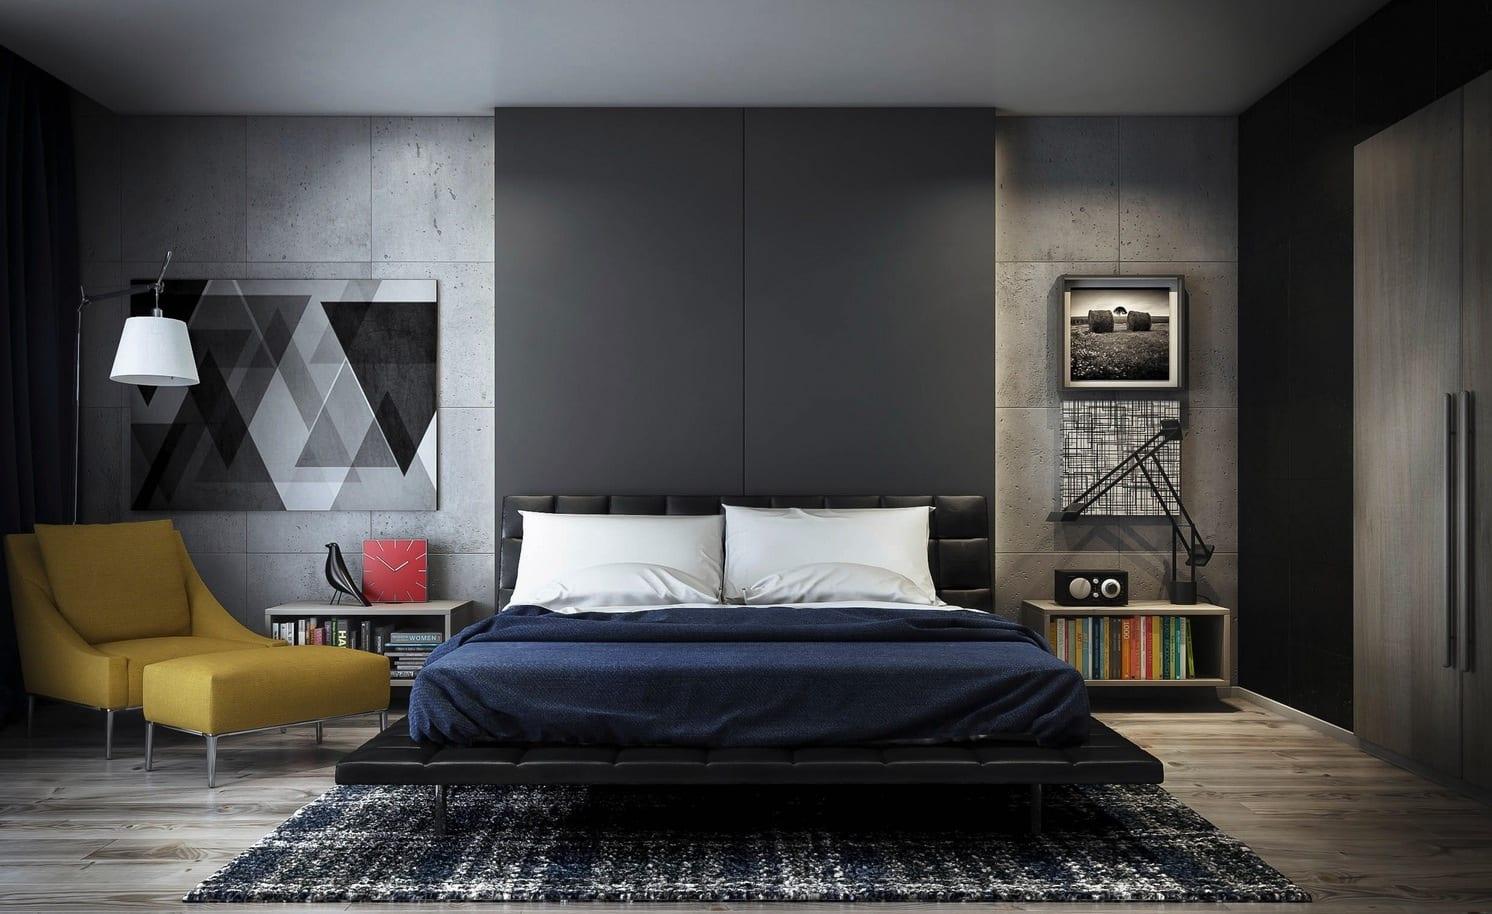 Emejing Modernes Schlafzimmer Grau Pictures - Design & Ideas 2018 ...